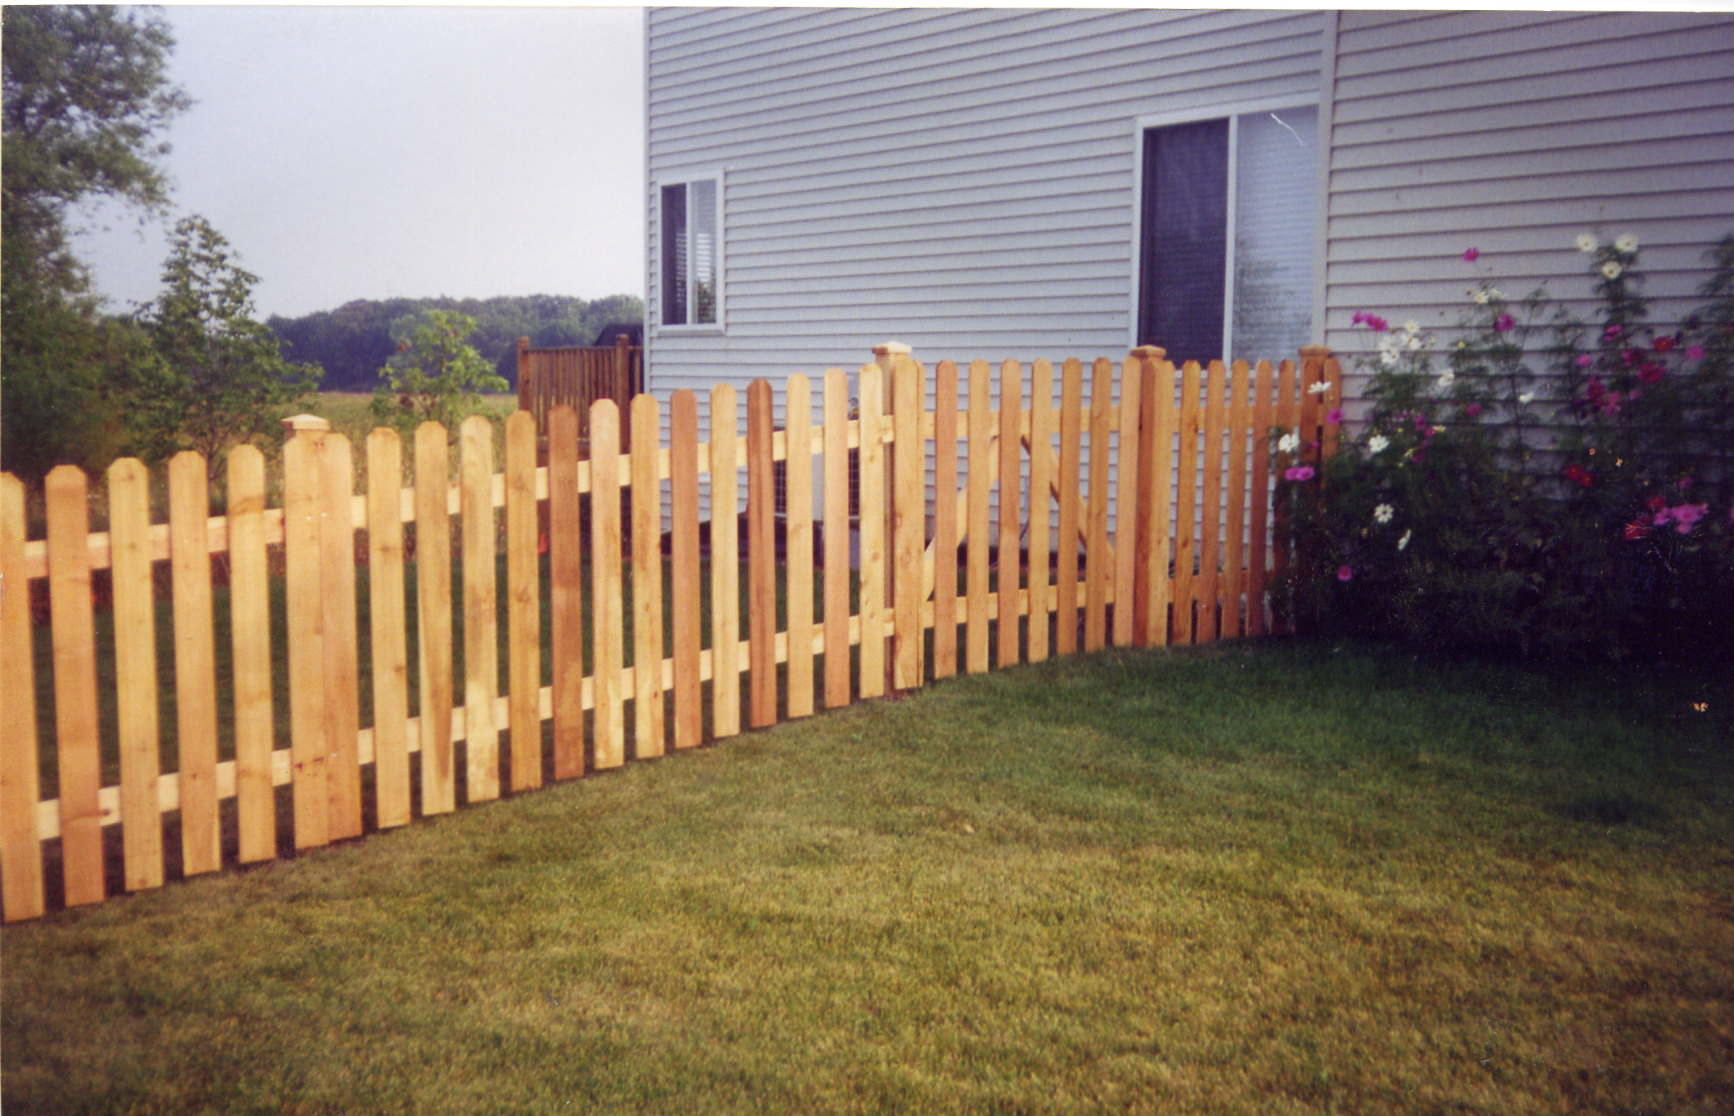 MASTERBILT Fence and Supplies, Inc  Phone: (847) 336-8335